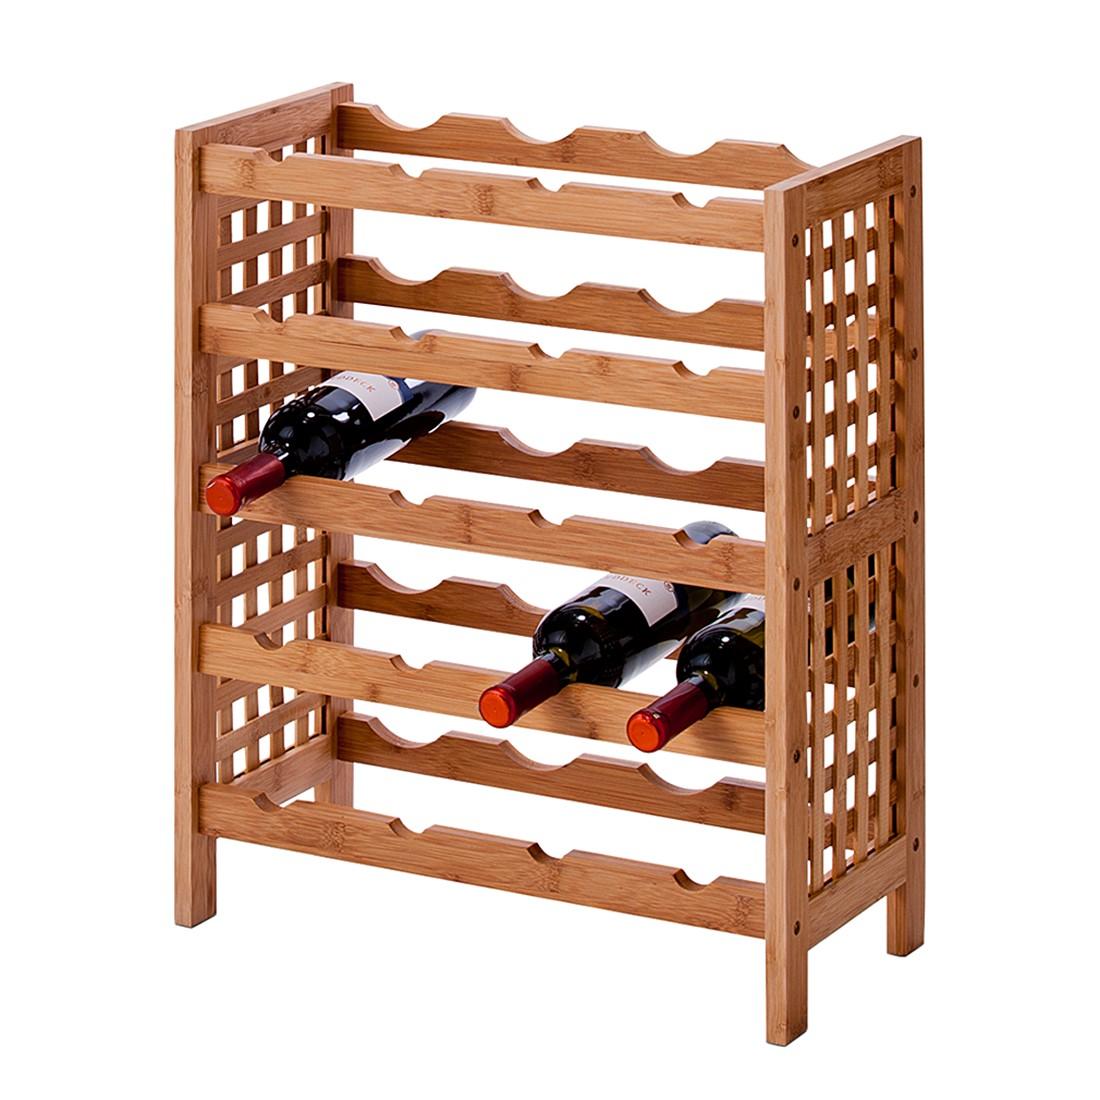 weinregal hakon bambus braun zeller online bestellen. Black Bedroom Furniture Sets. Home Design Ideas